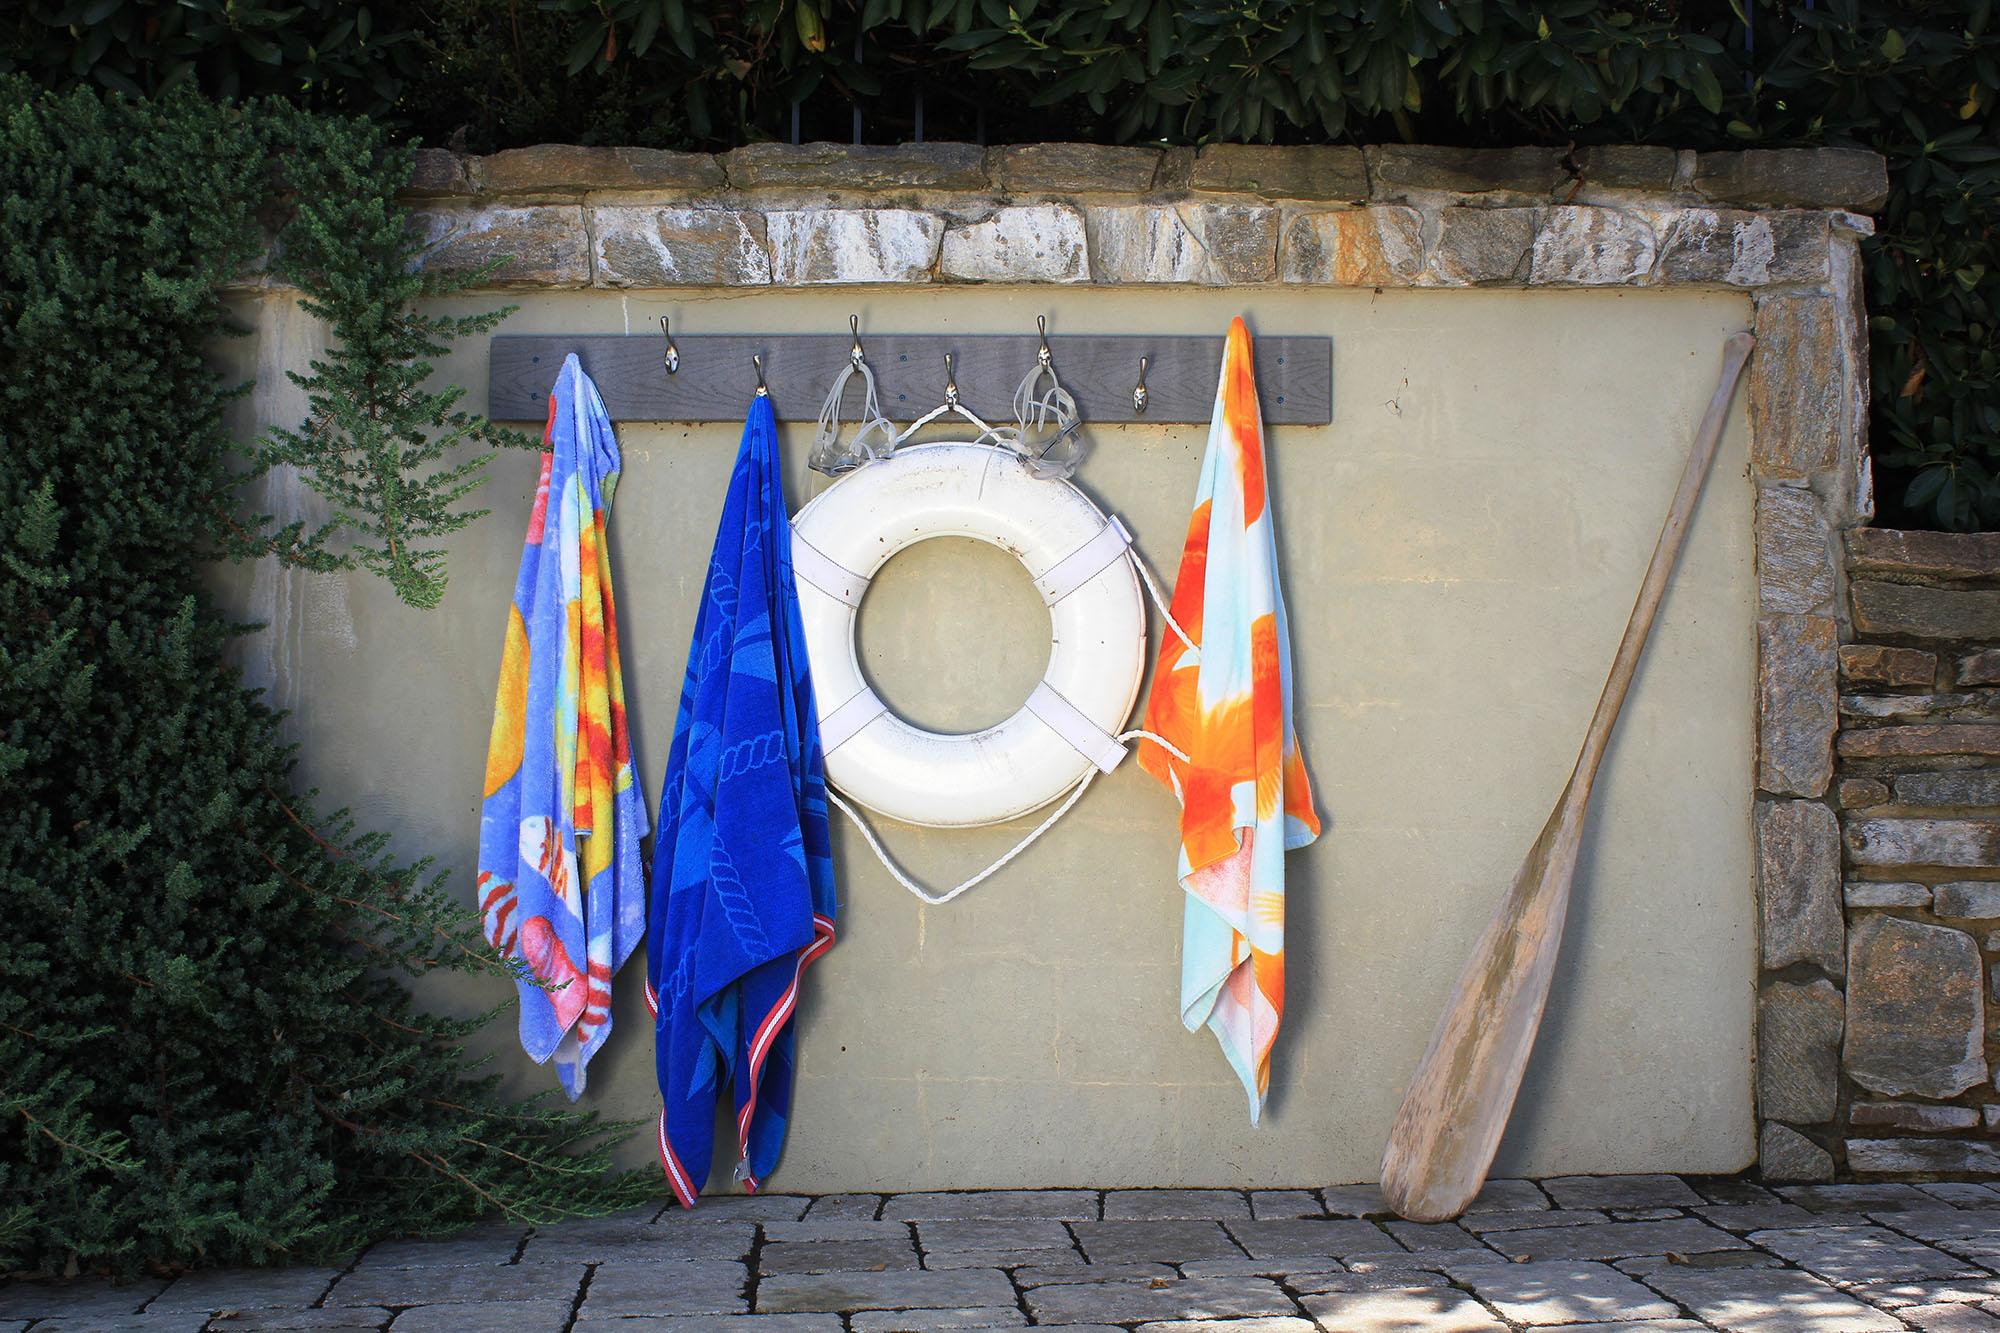 towel holder 6123.jpg